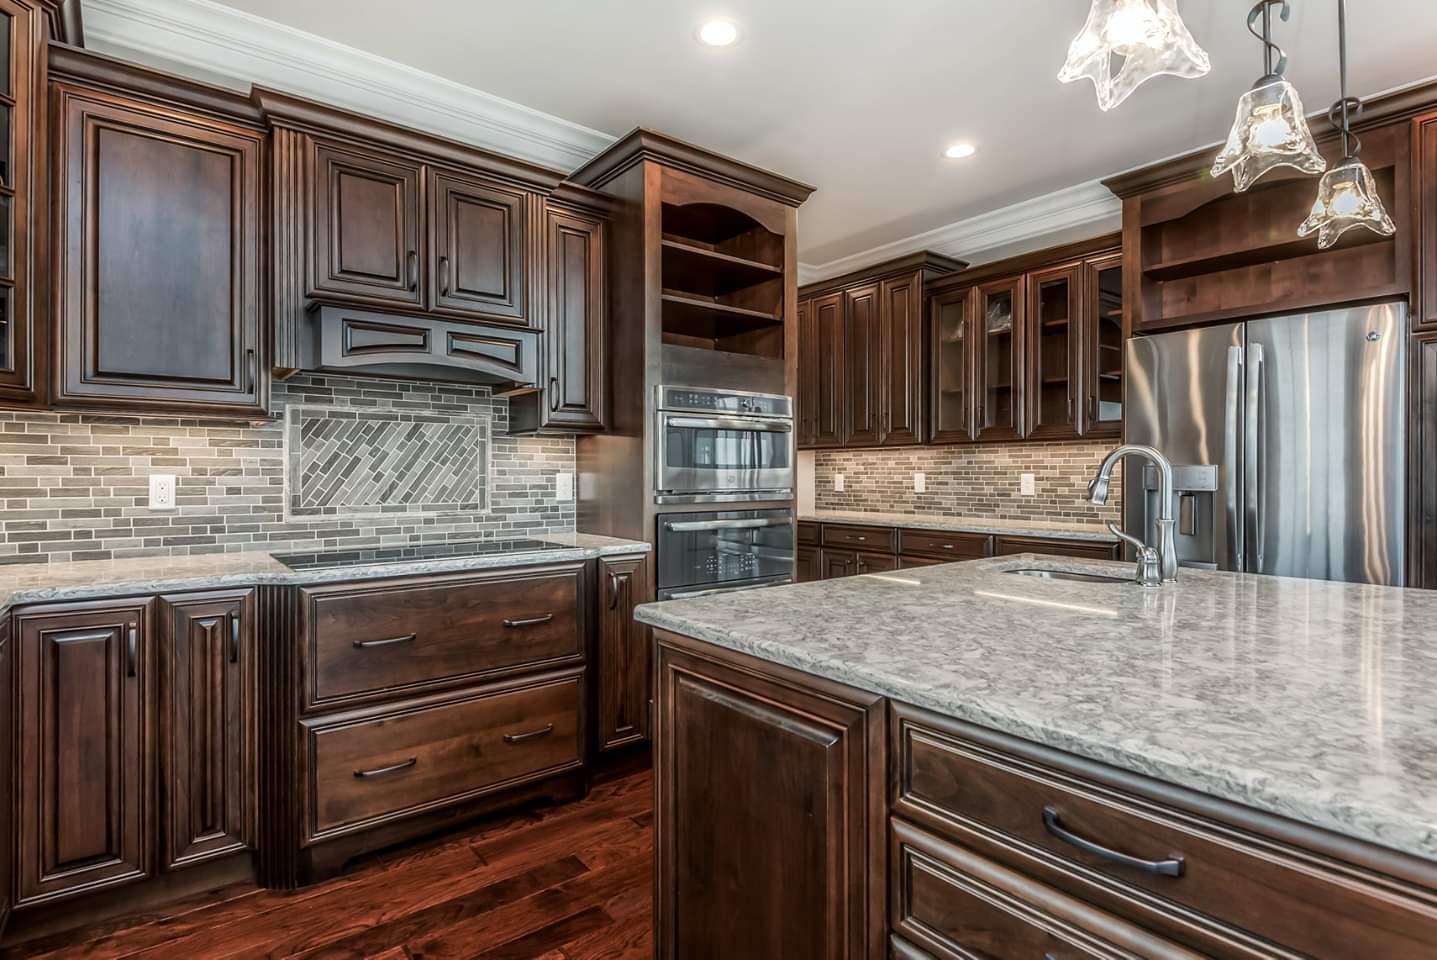 Kitchen Pictures - Knoxville, TN - Kitchen Sales